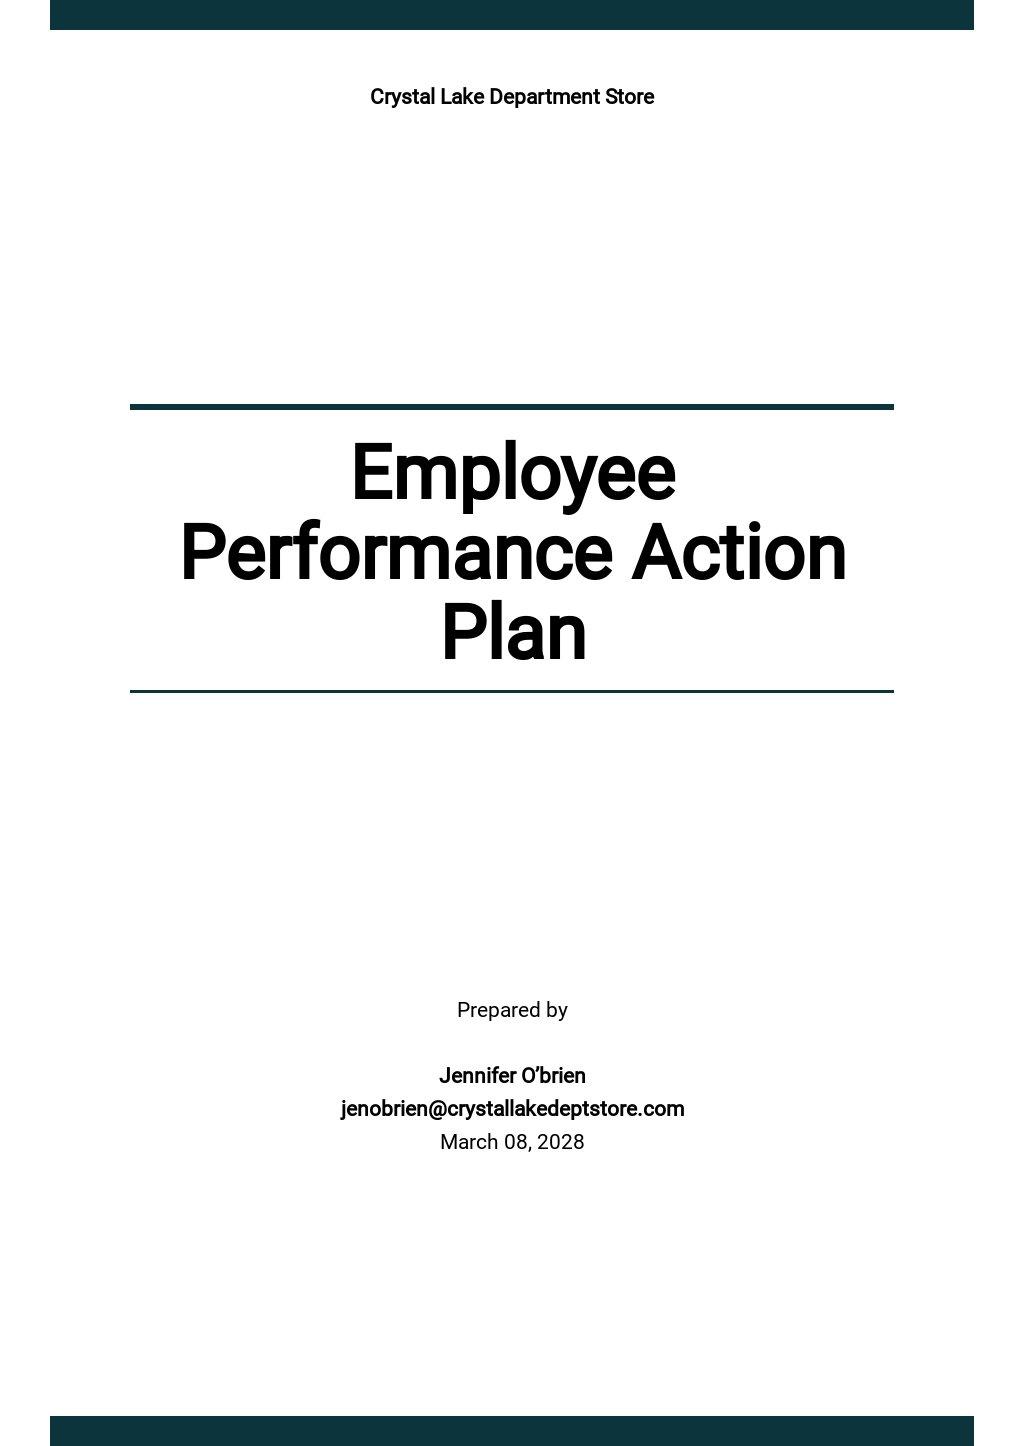 Employee Performance Action Plan Template.jpe